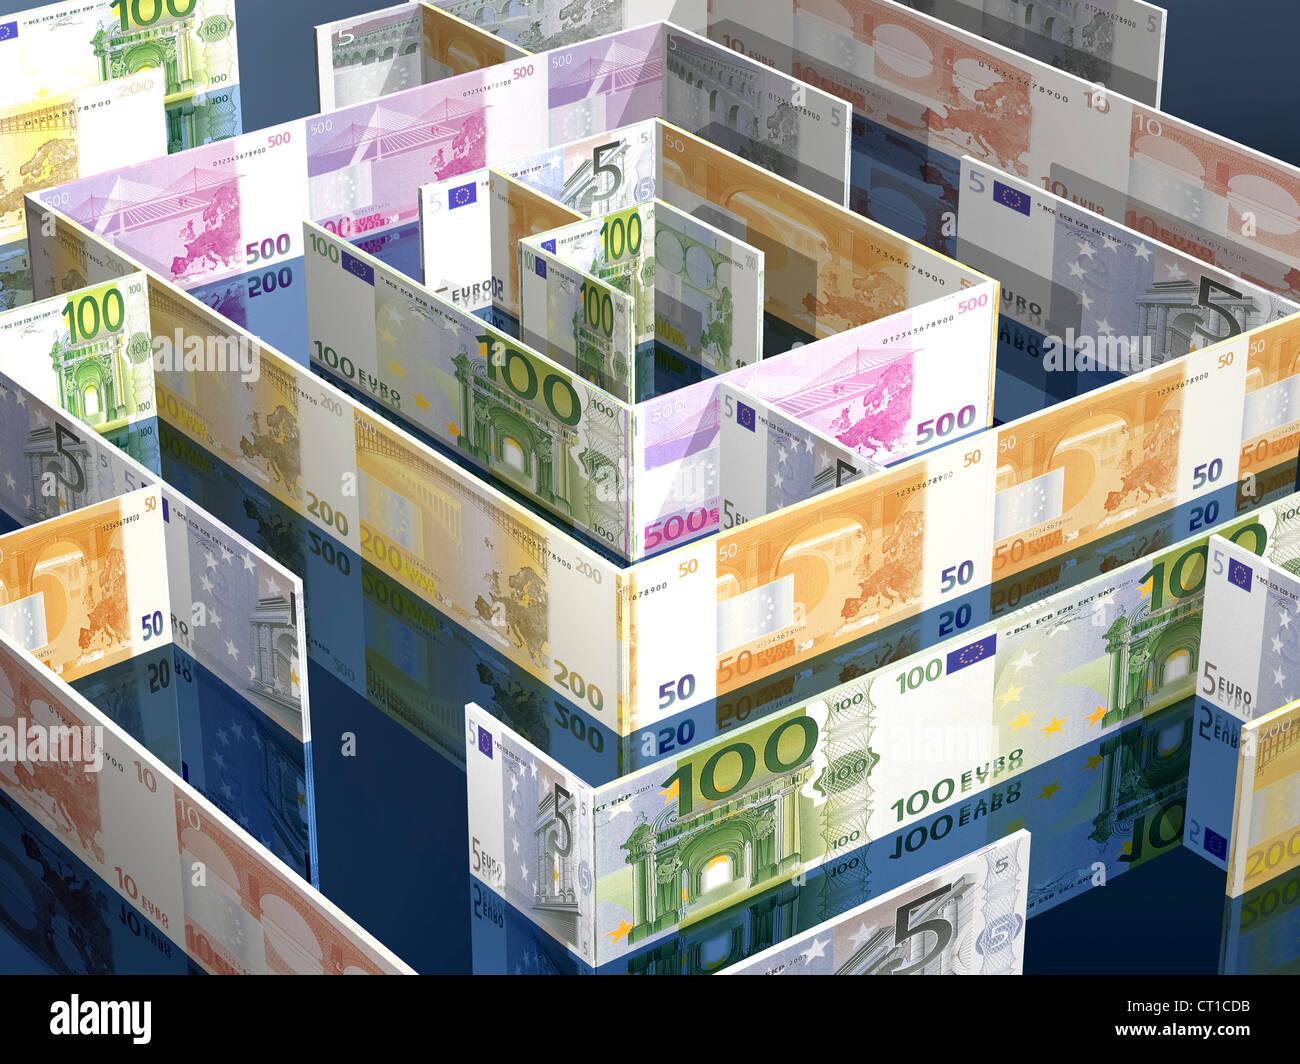 labyrinth made of Euro bills - Labyrinth aus Euroscheinen - Stock Image